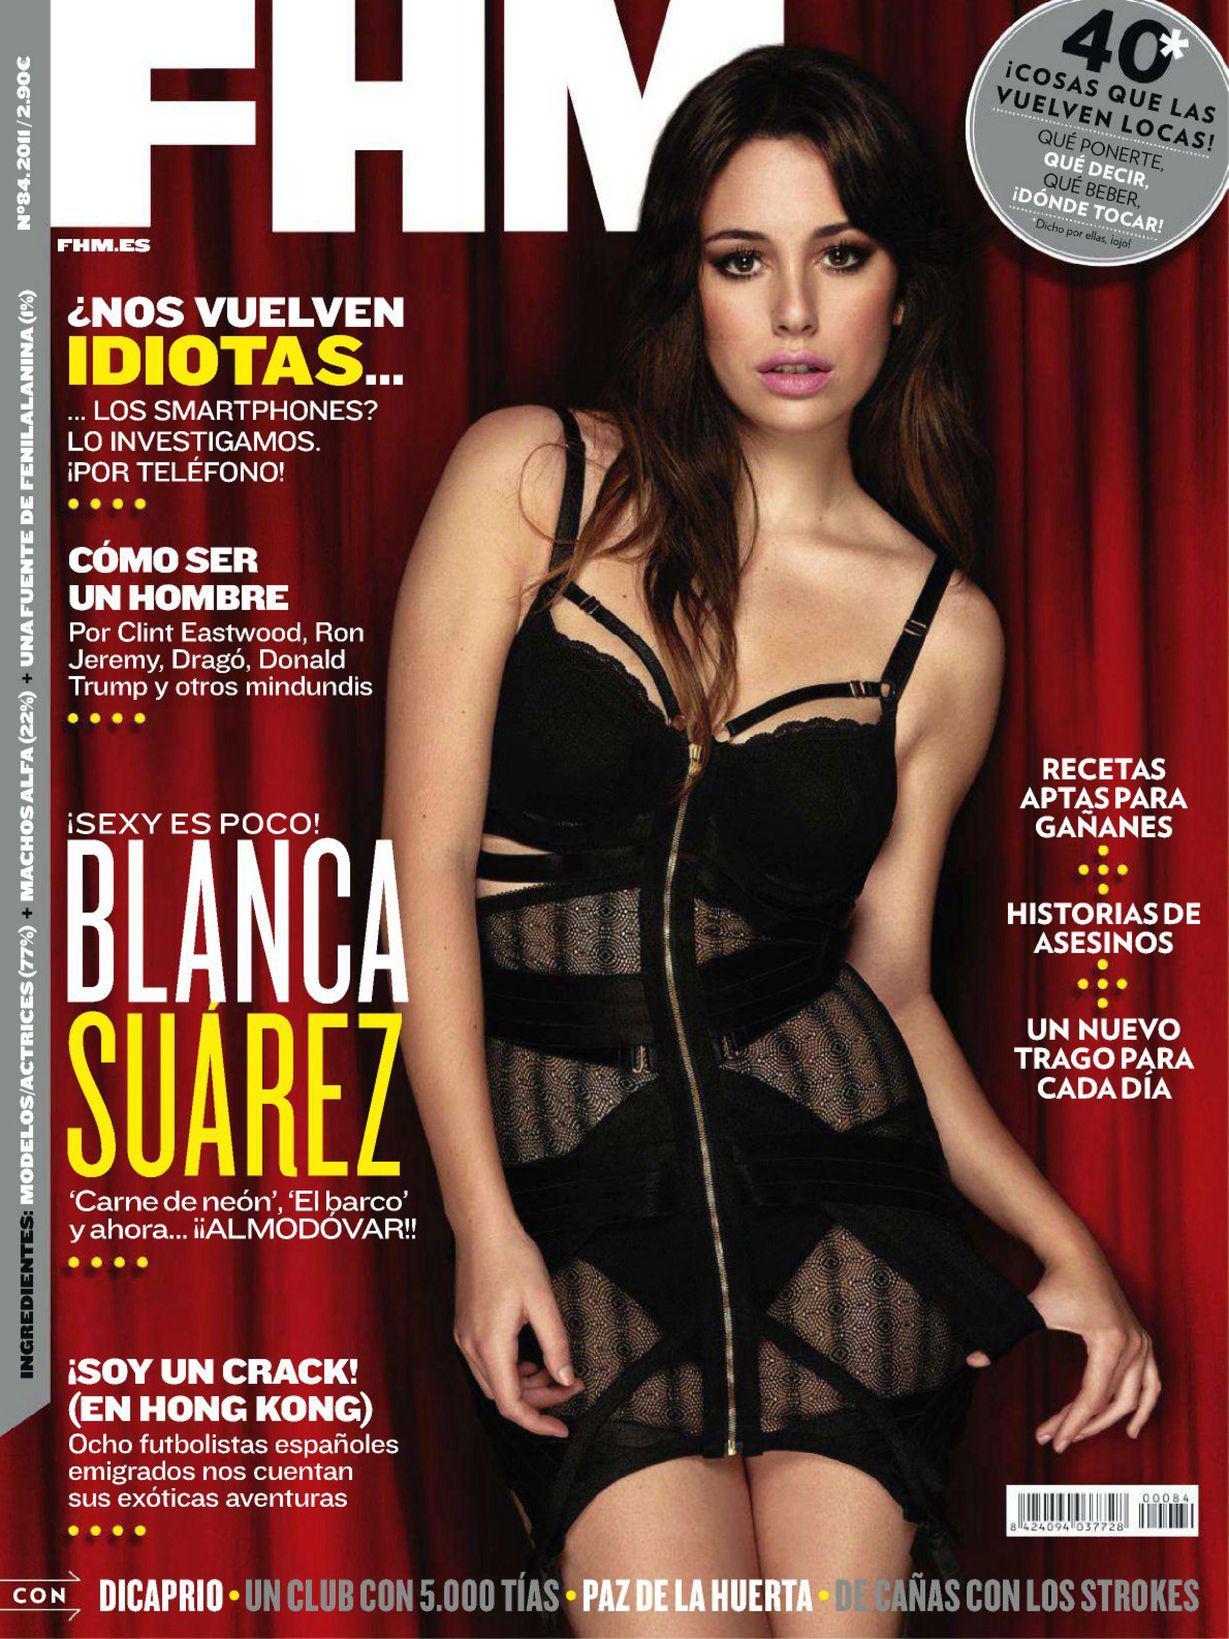 Blanca Suarez desnuda porno FHM